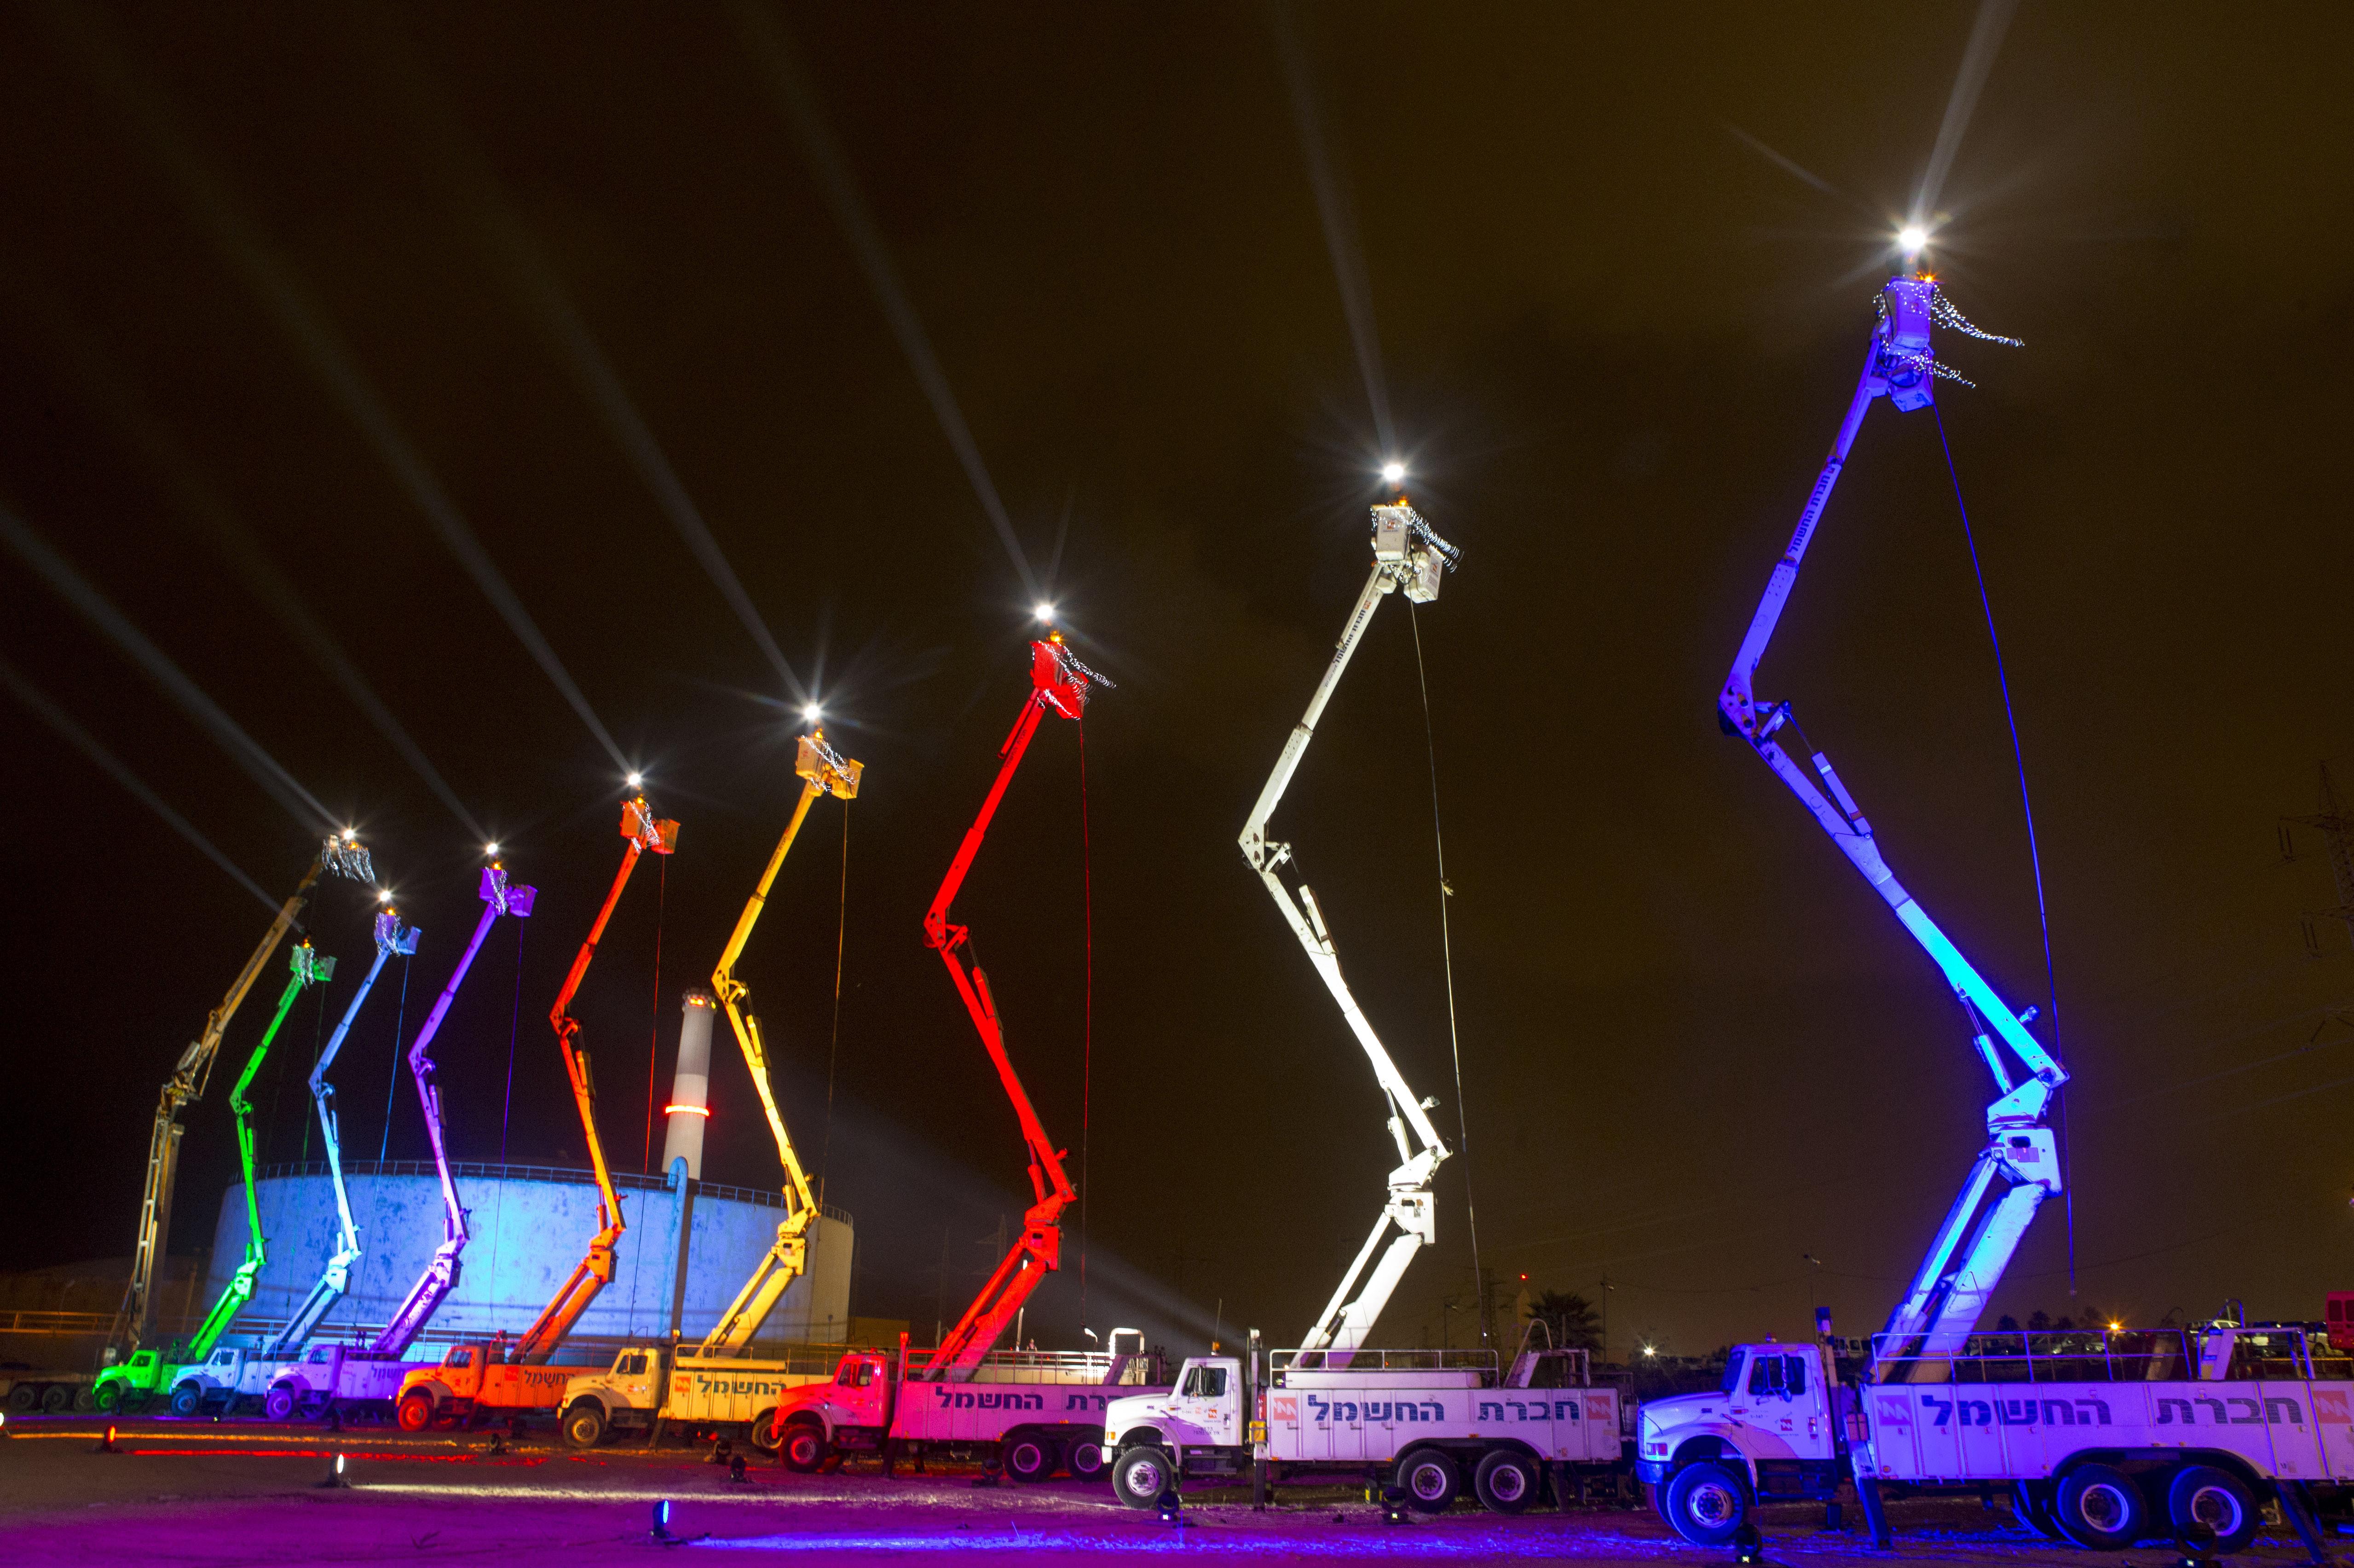 An Israeli electric  company arranges cranes in the shape of a Hanukkah menorah.